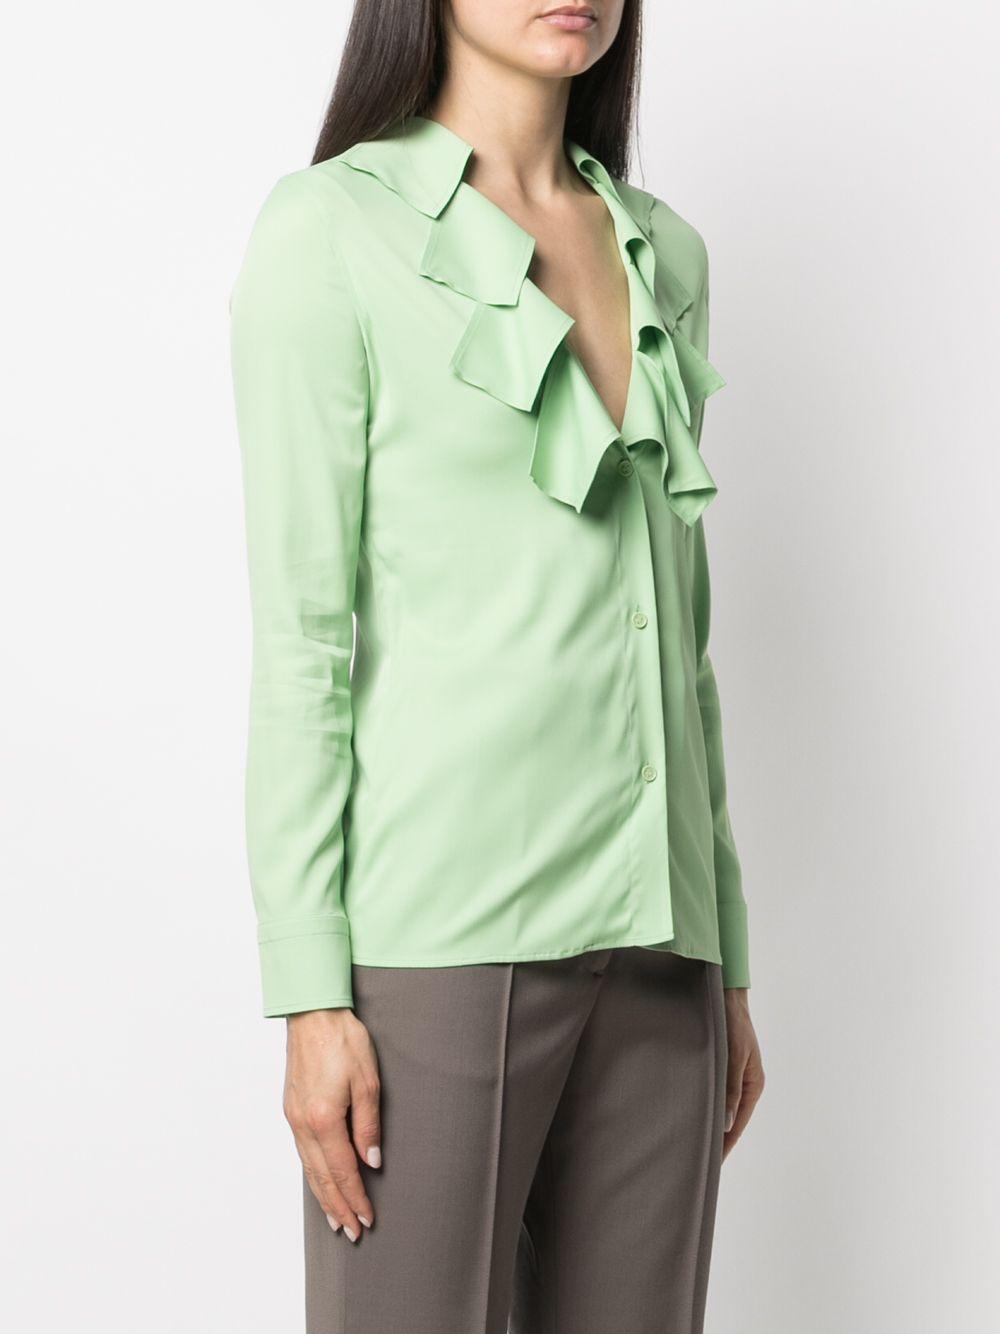 viscose light green blouse featuring cut-out detailing BOTTEGA VENETA |  | 646584-V01N03516